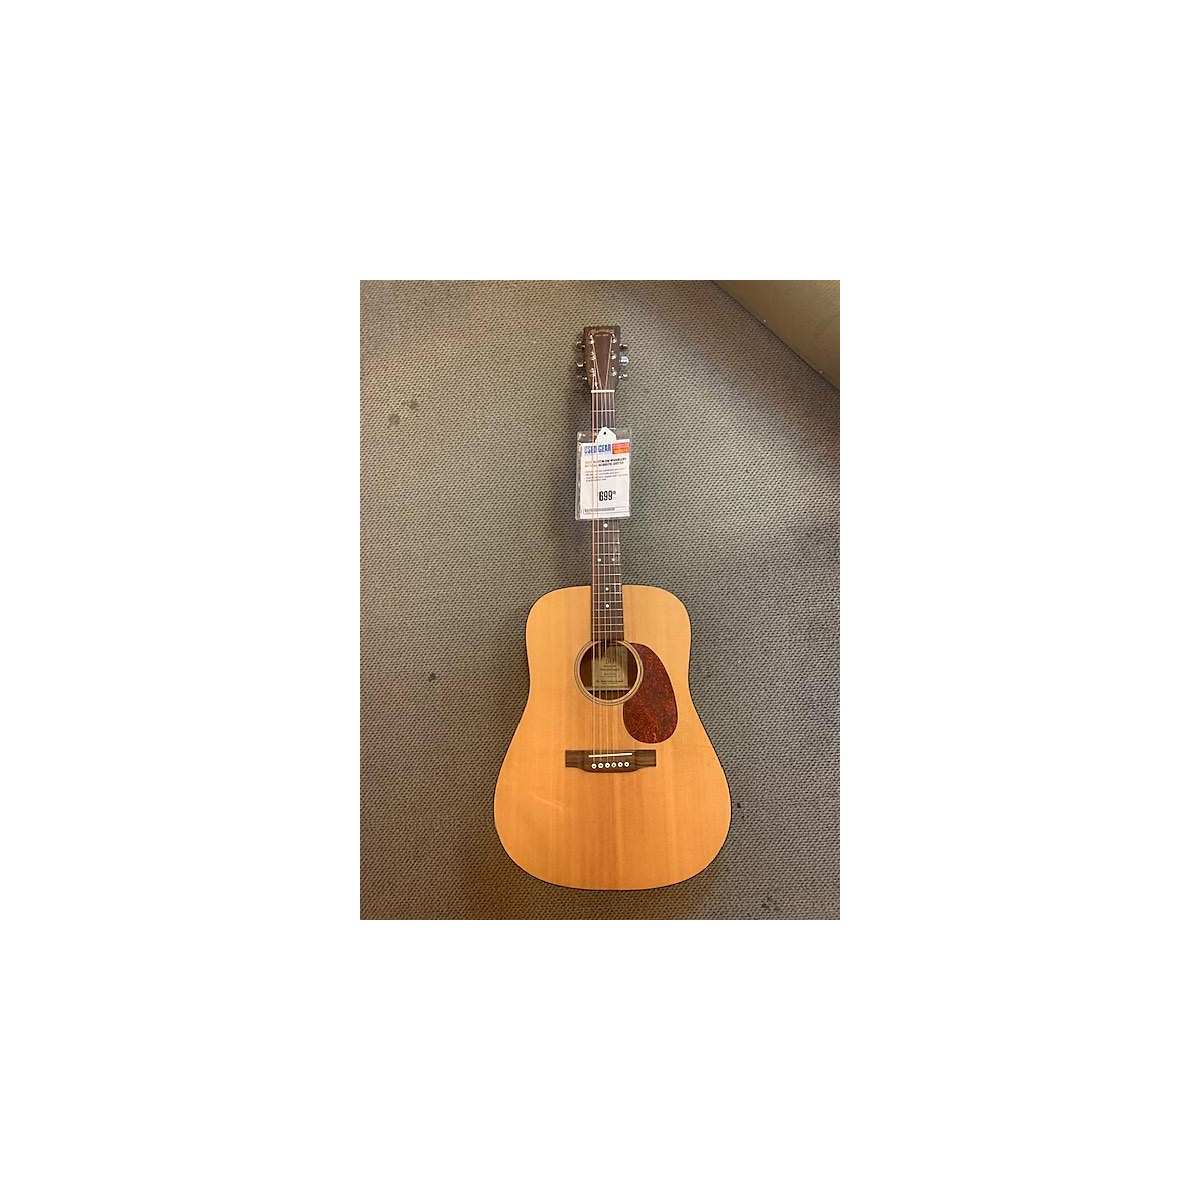 Martin DM Mahogany Acoustic Guitar